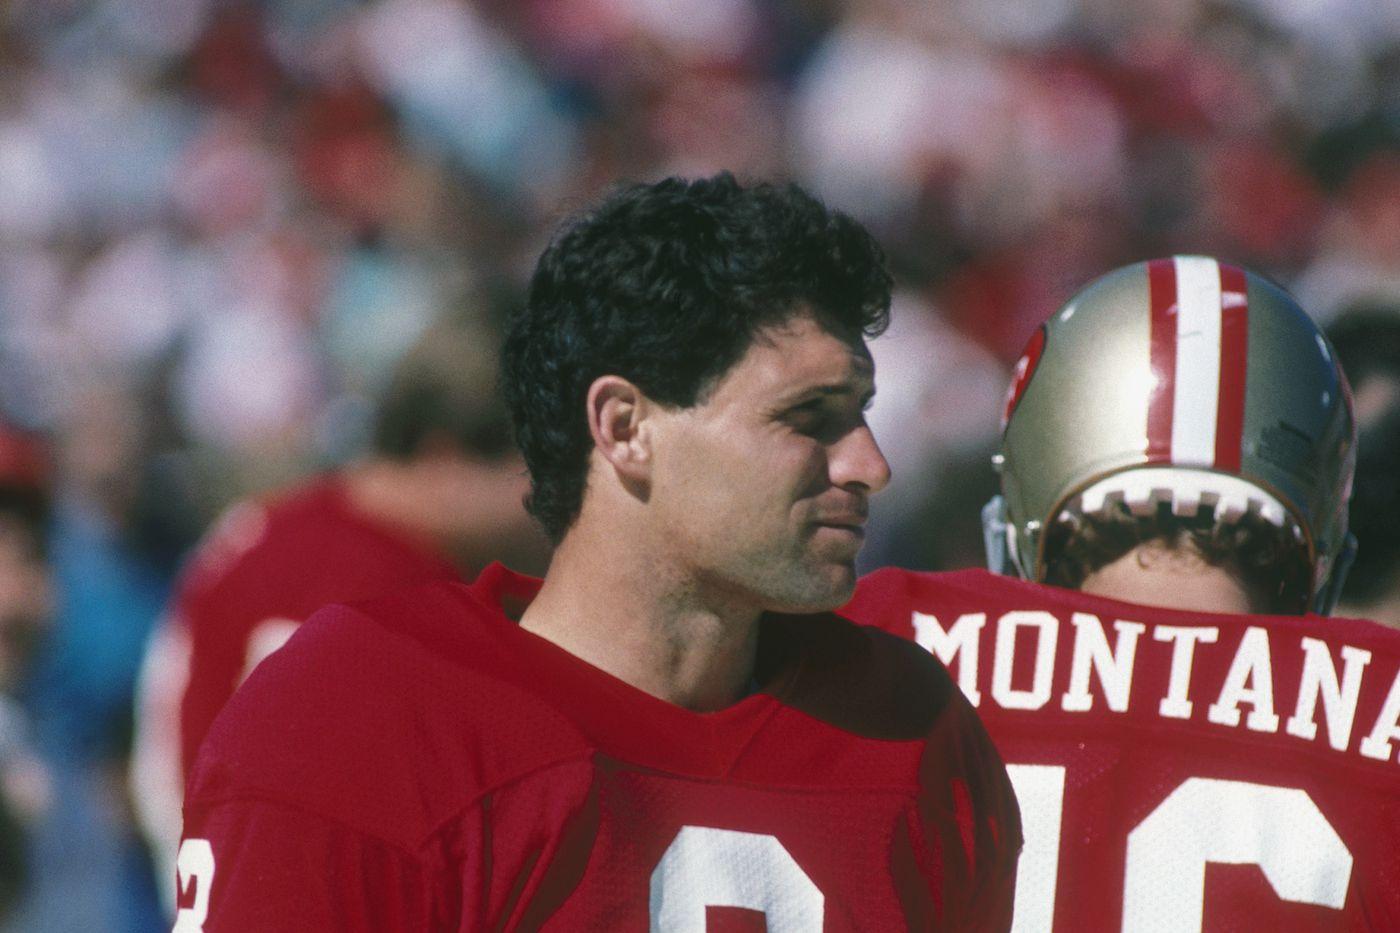 Starting lineup Joe Montana  1992 San Francisco 49ERS